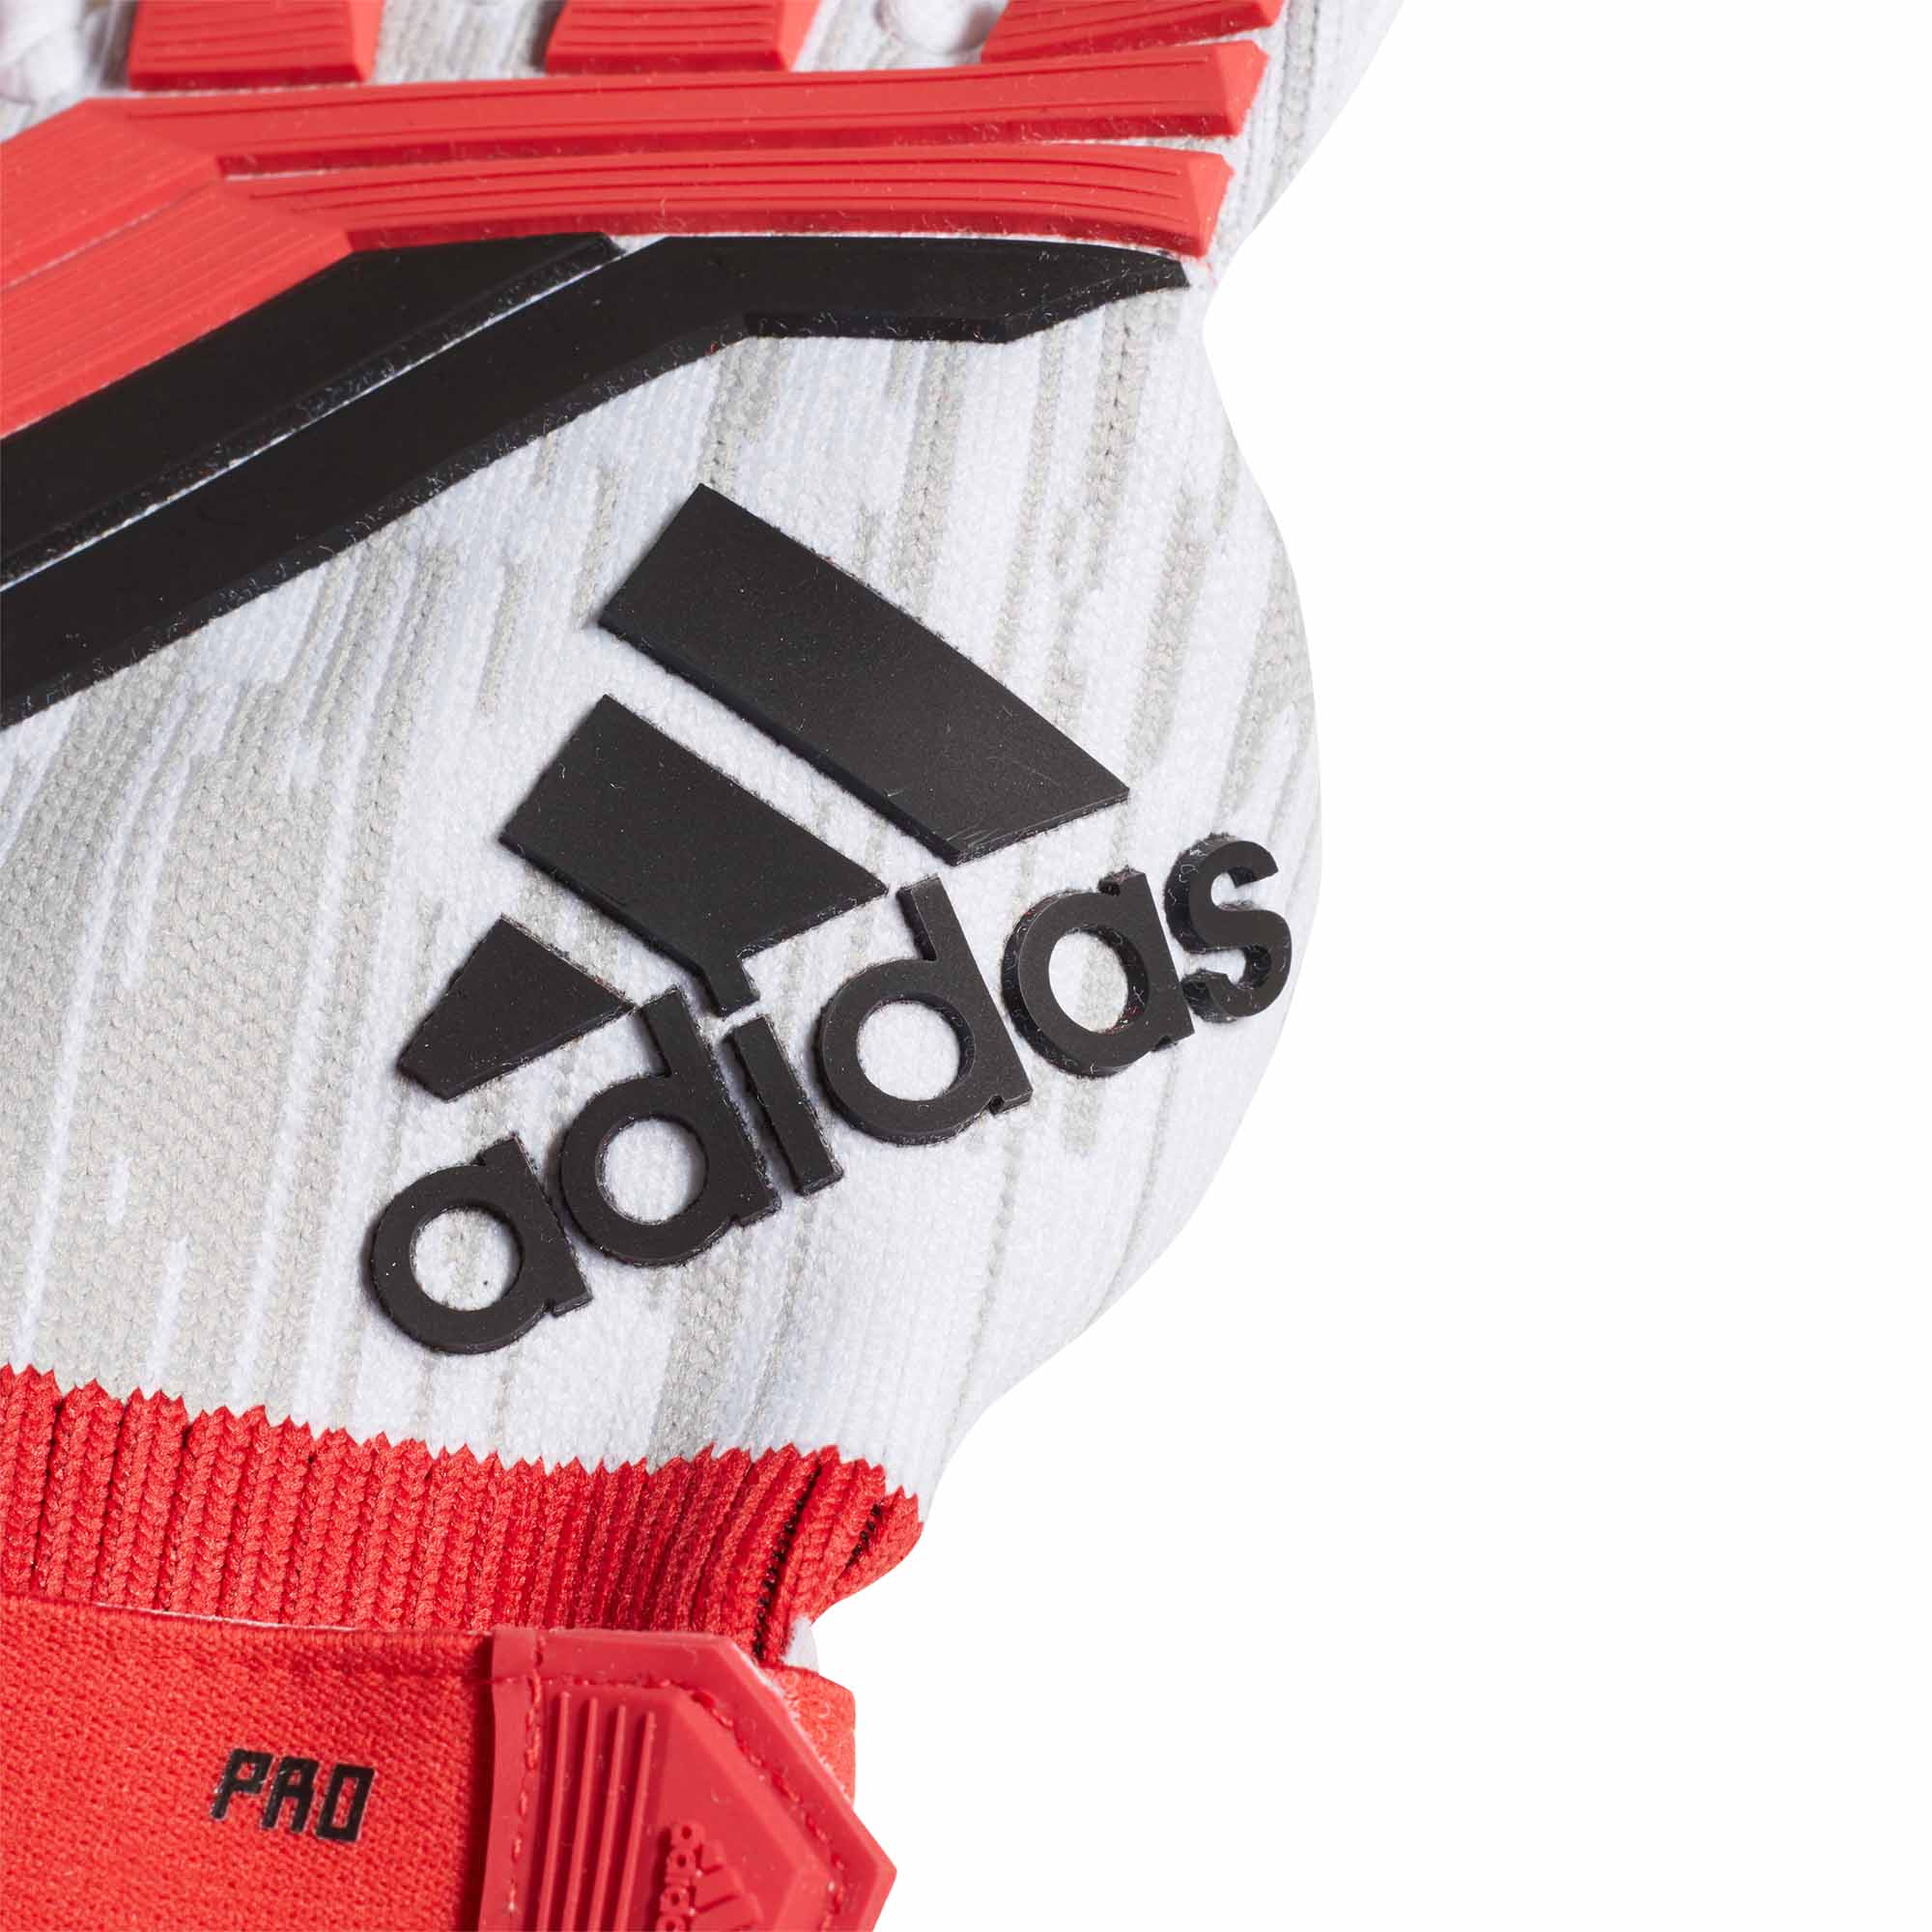 Adidas Predator Tamaño De Los Guantes De Portero 9 Pro mrsmql